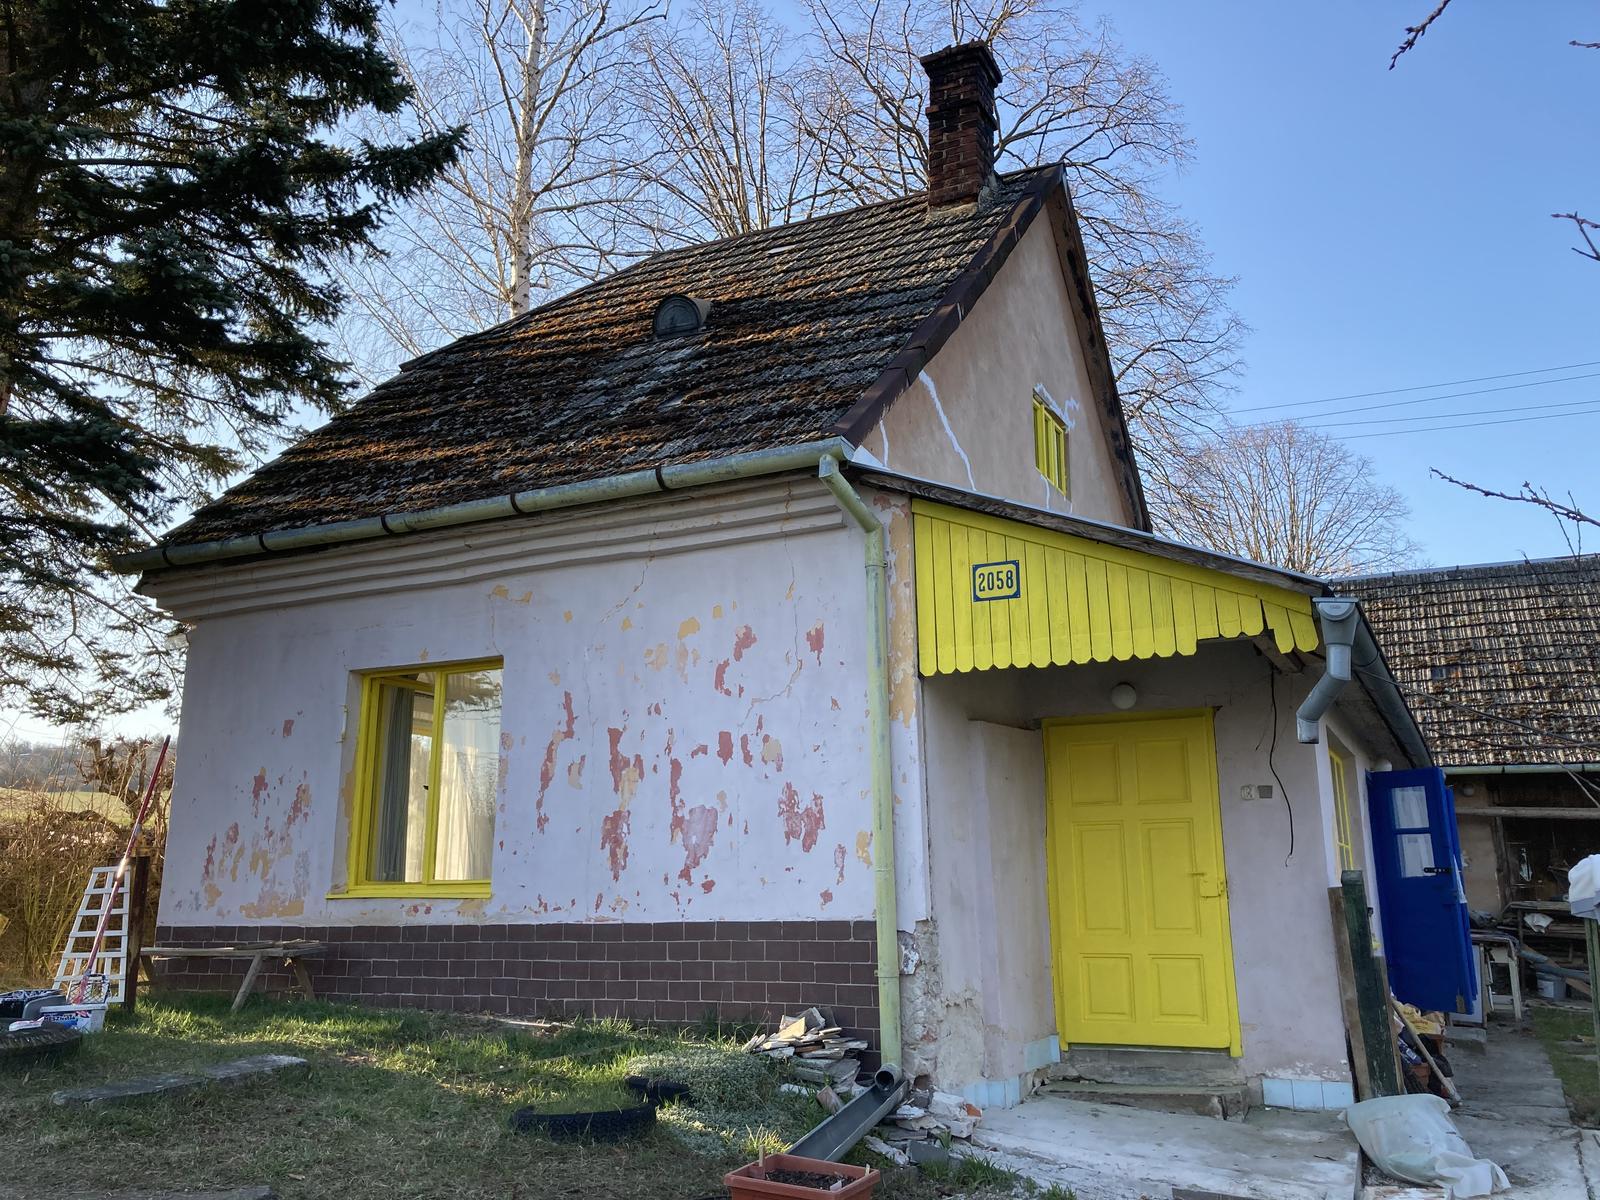 Dom - Obrázok č. 182